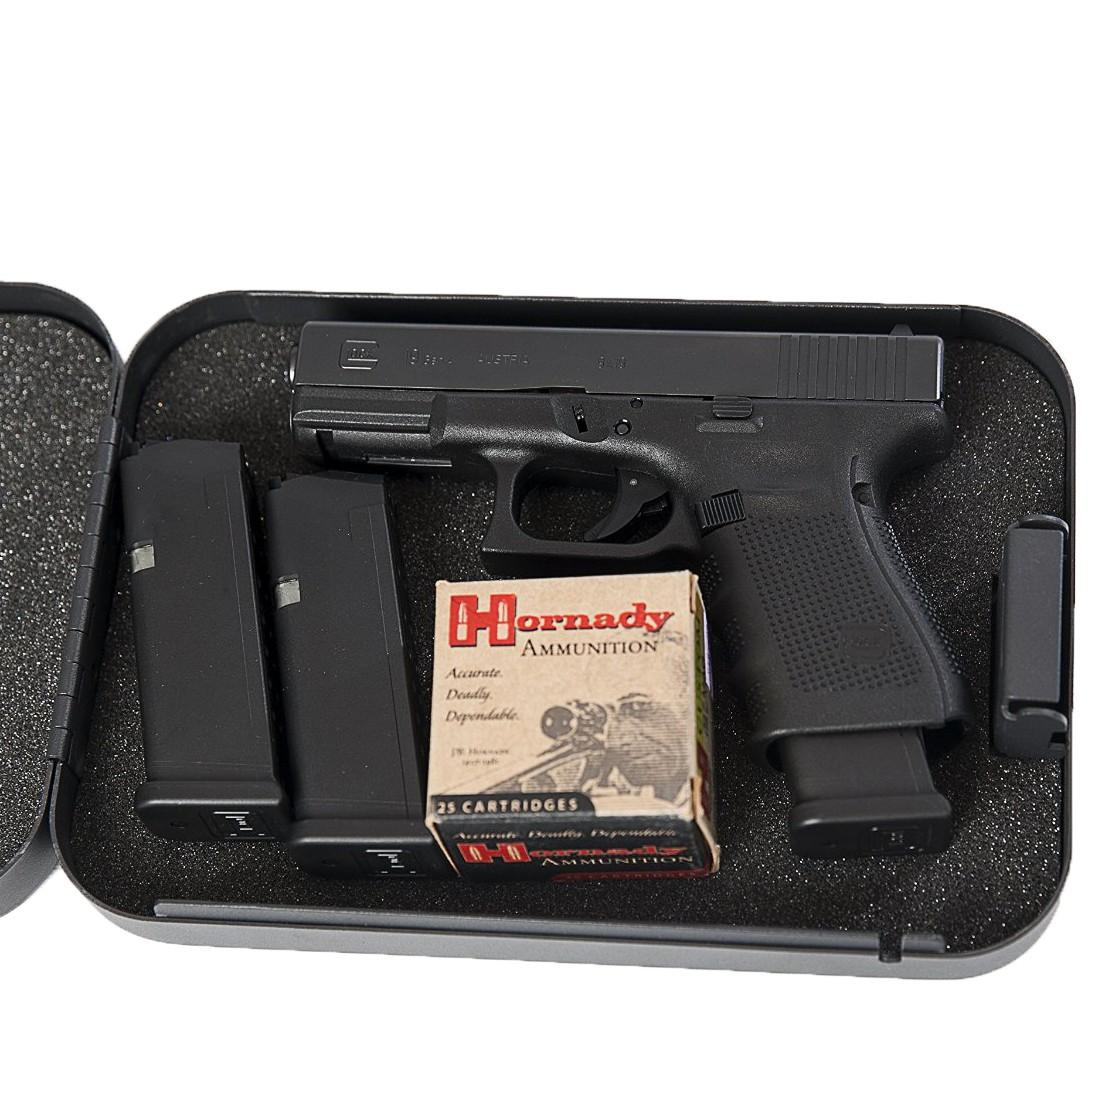 Gun Vault XLarge Combination Lock Box Car Truck Home Pistol Safe Handgun Lockbox